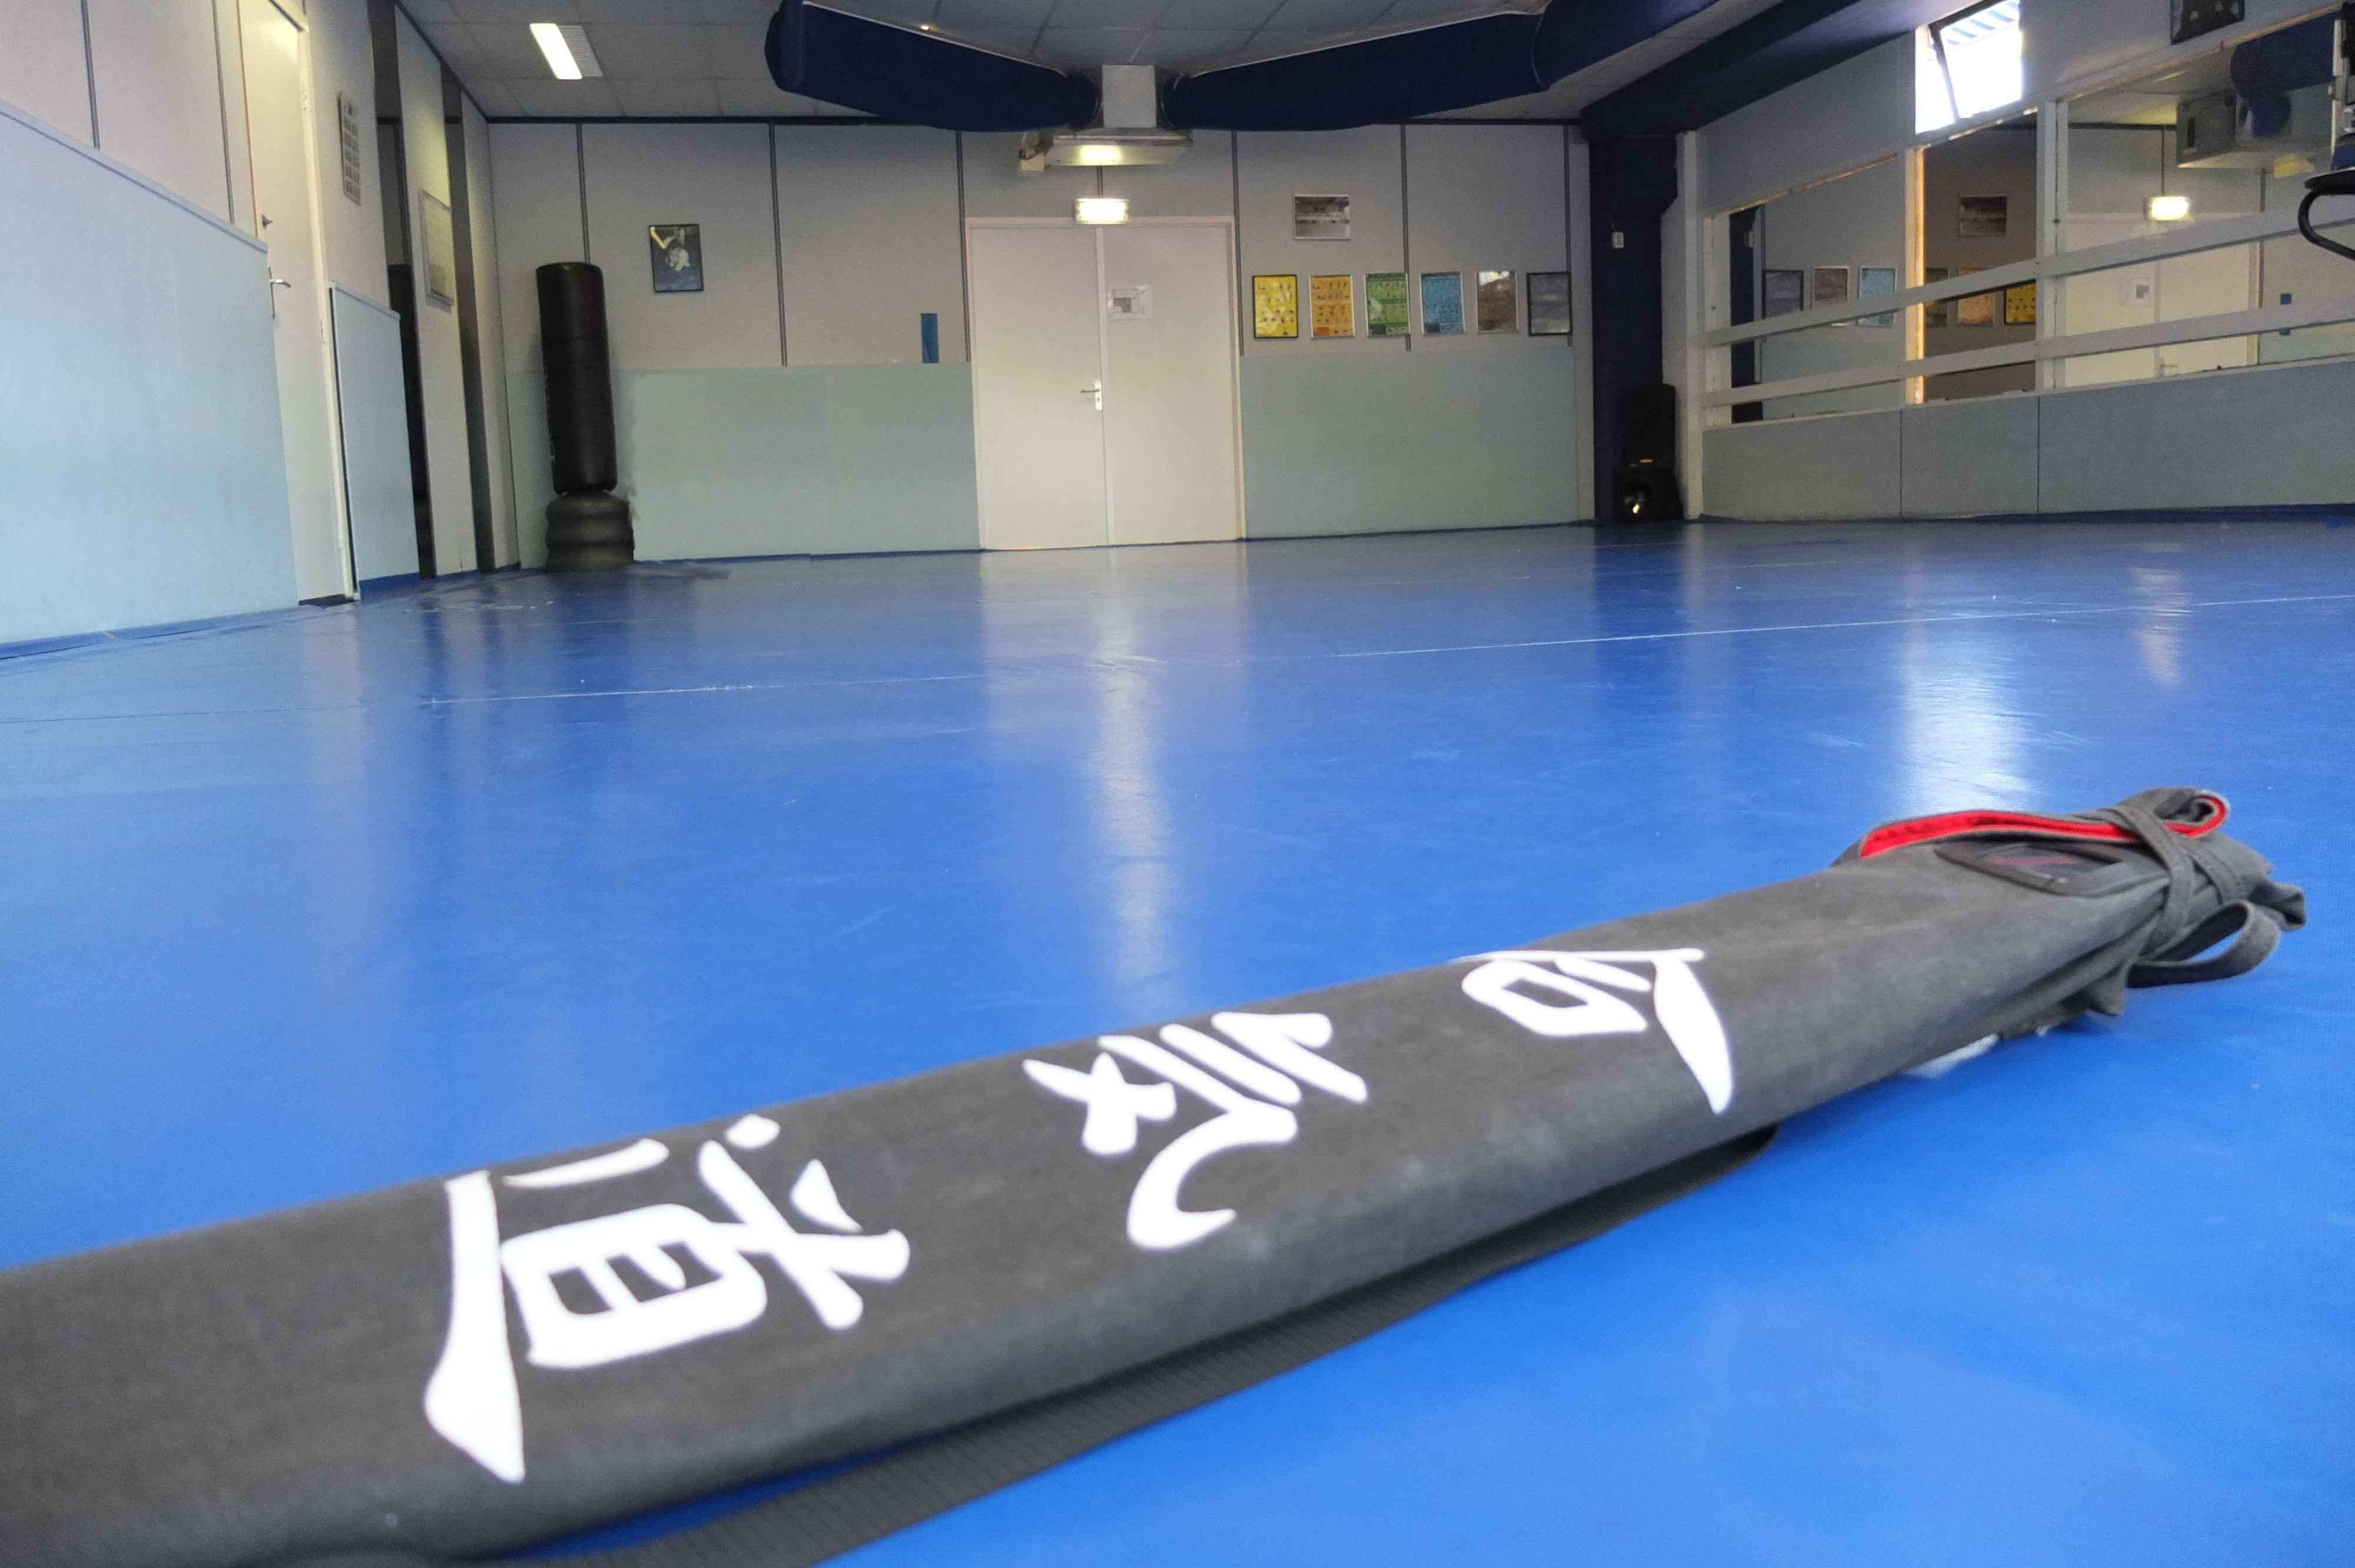 De plek om aikido te leren!